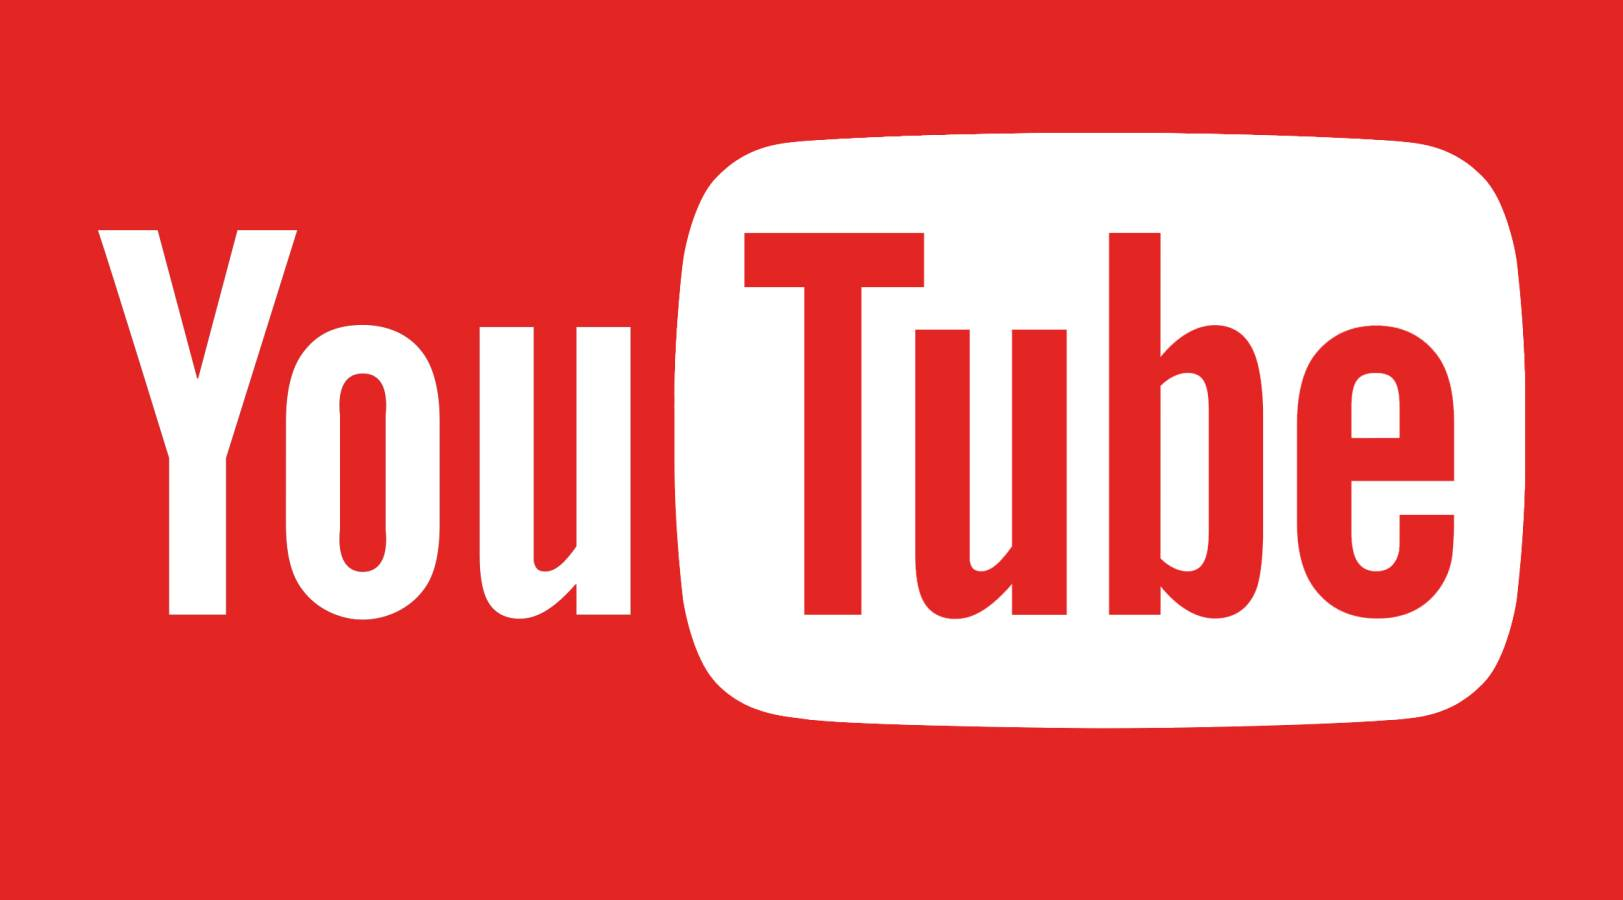 YouTube Actualizarea Noua Lansata cu Schimbari in Telefoane, Tablete